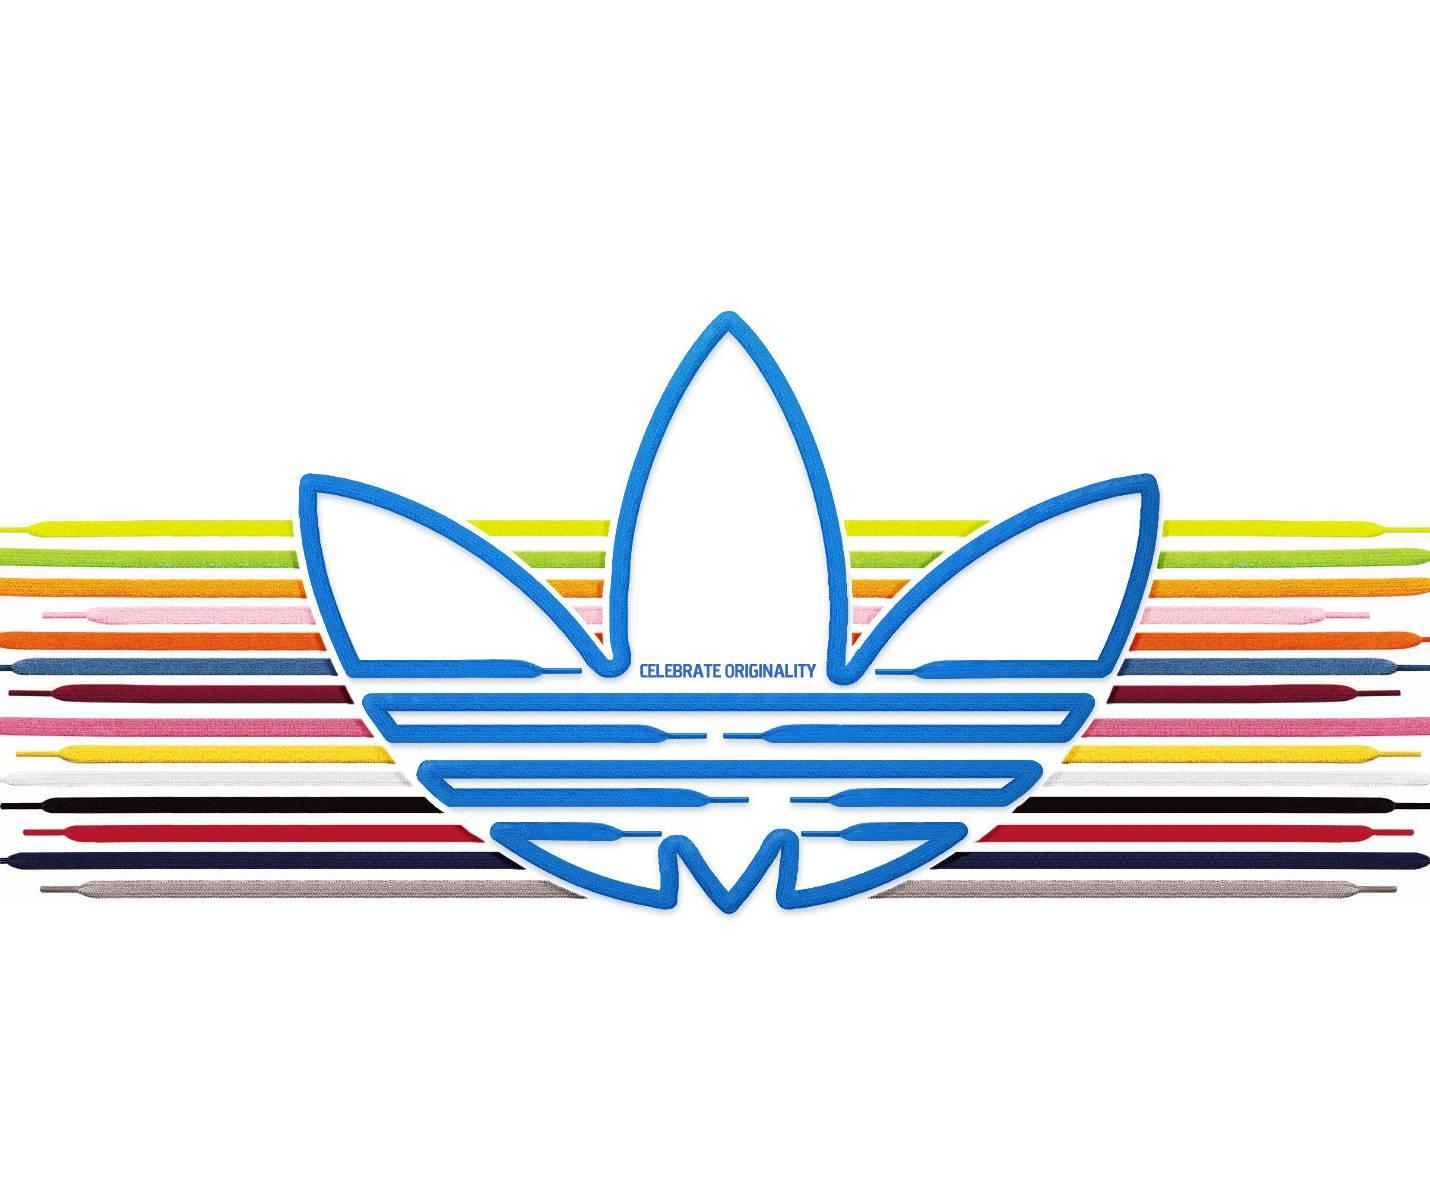 Adidas Original Wallpaper By Jerrykeh 22 Free On Zedge